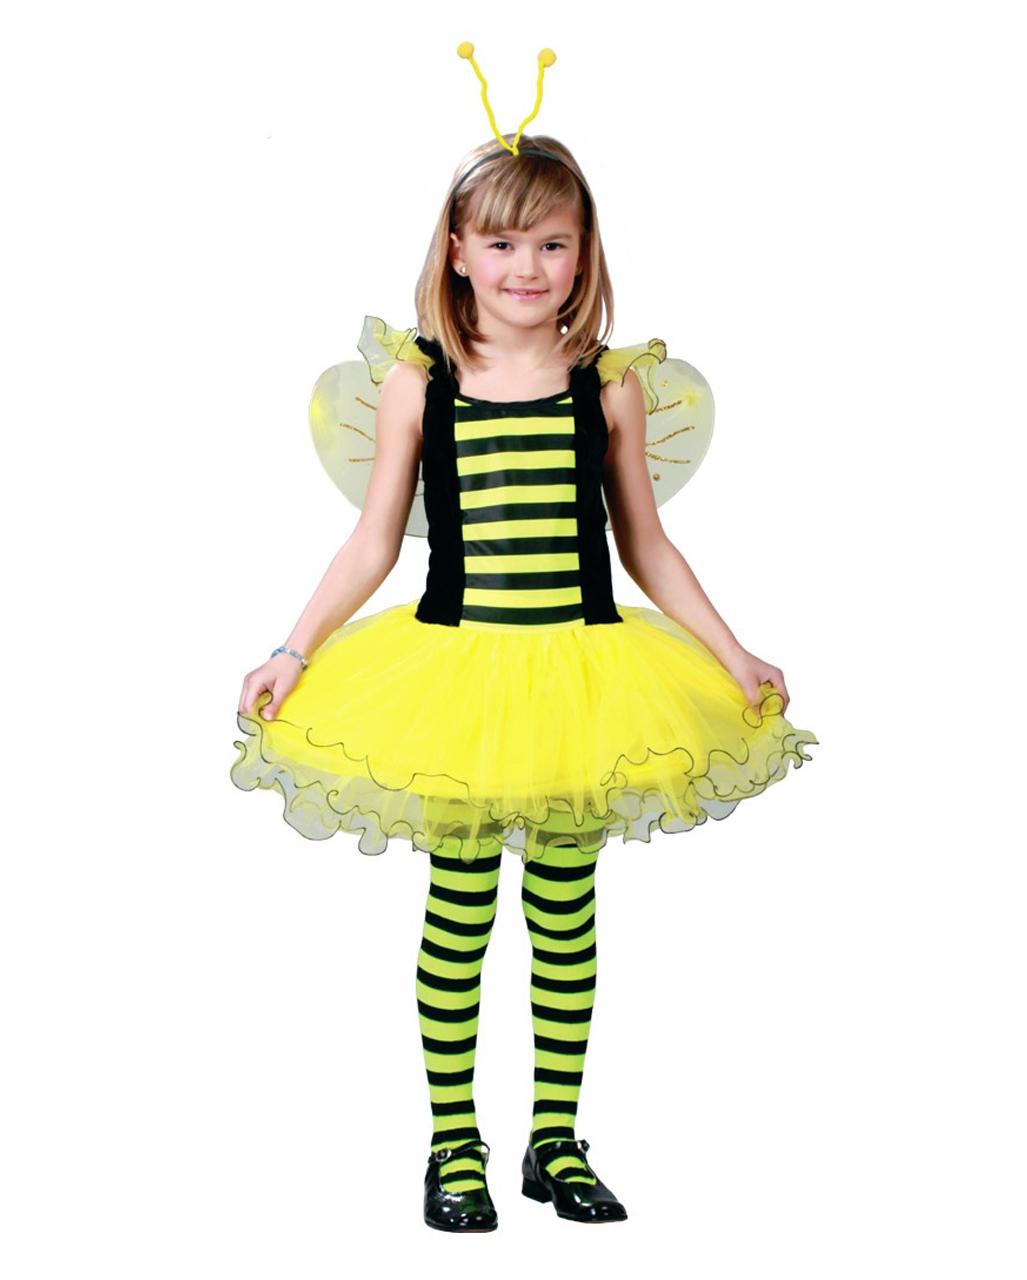 Bienen Fee Kinderkostum Marchenkostum Horror Shop Com